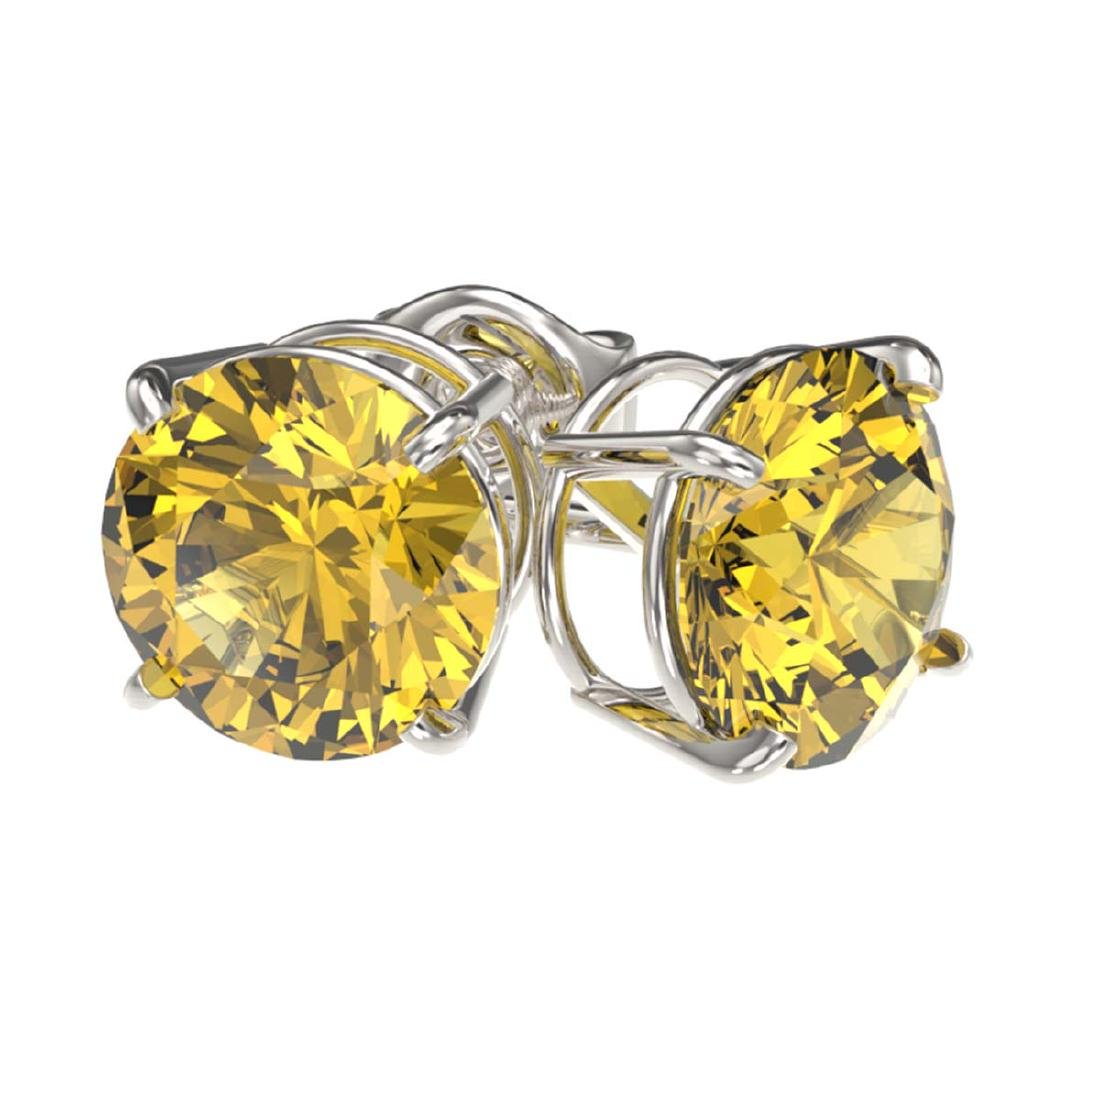 2 ctw Intense Yellow Diamond Stud Earrings 10K White - 3